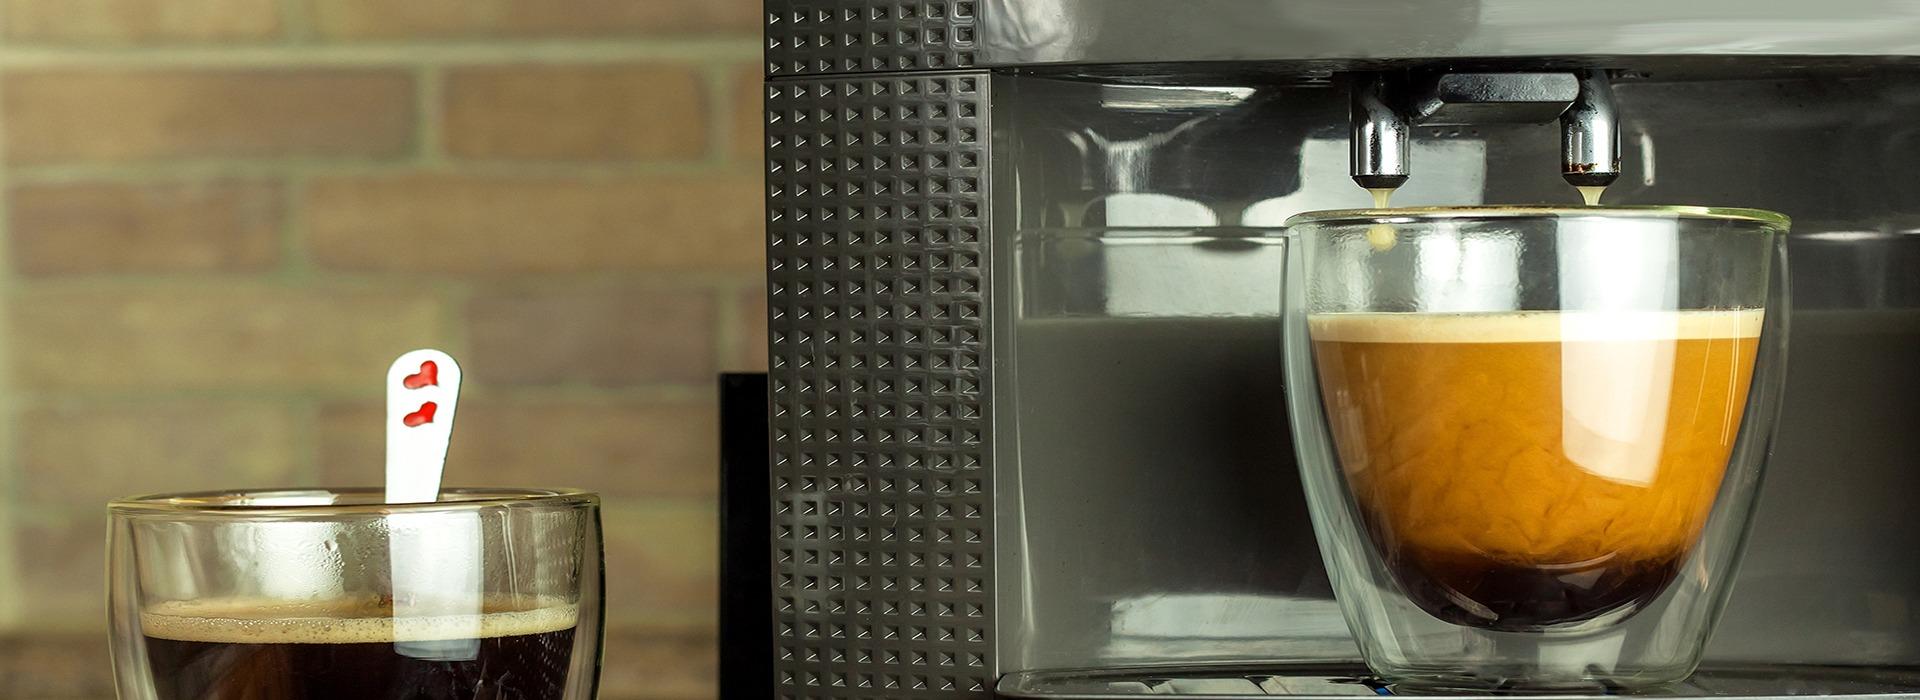 slide-macchina-caffe